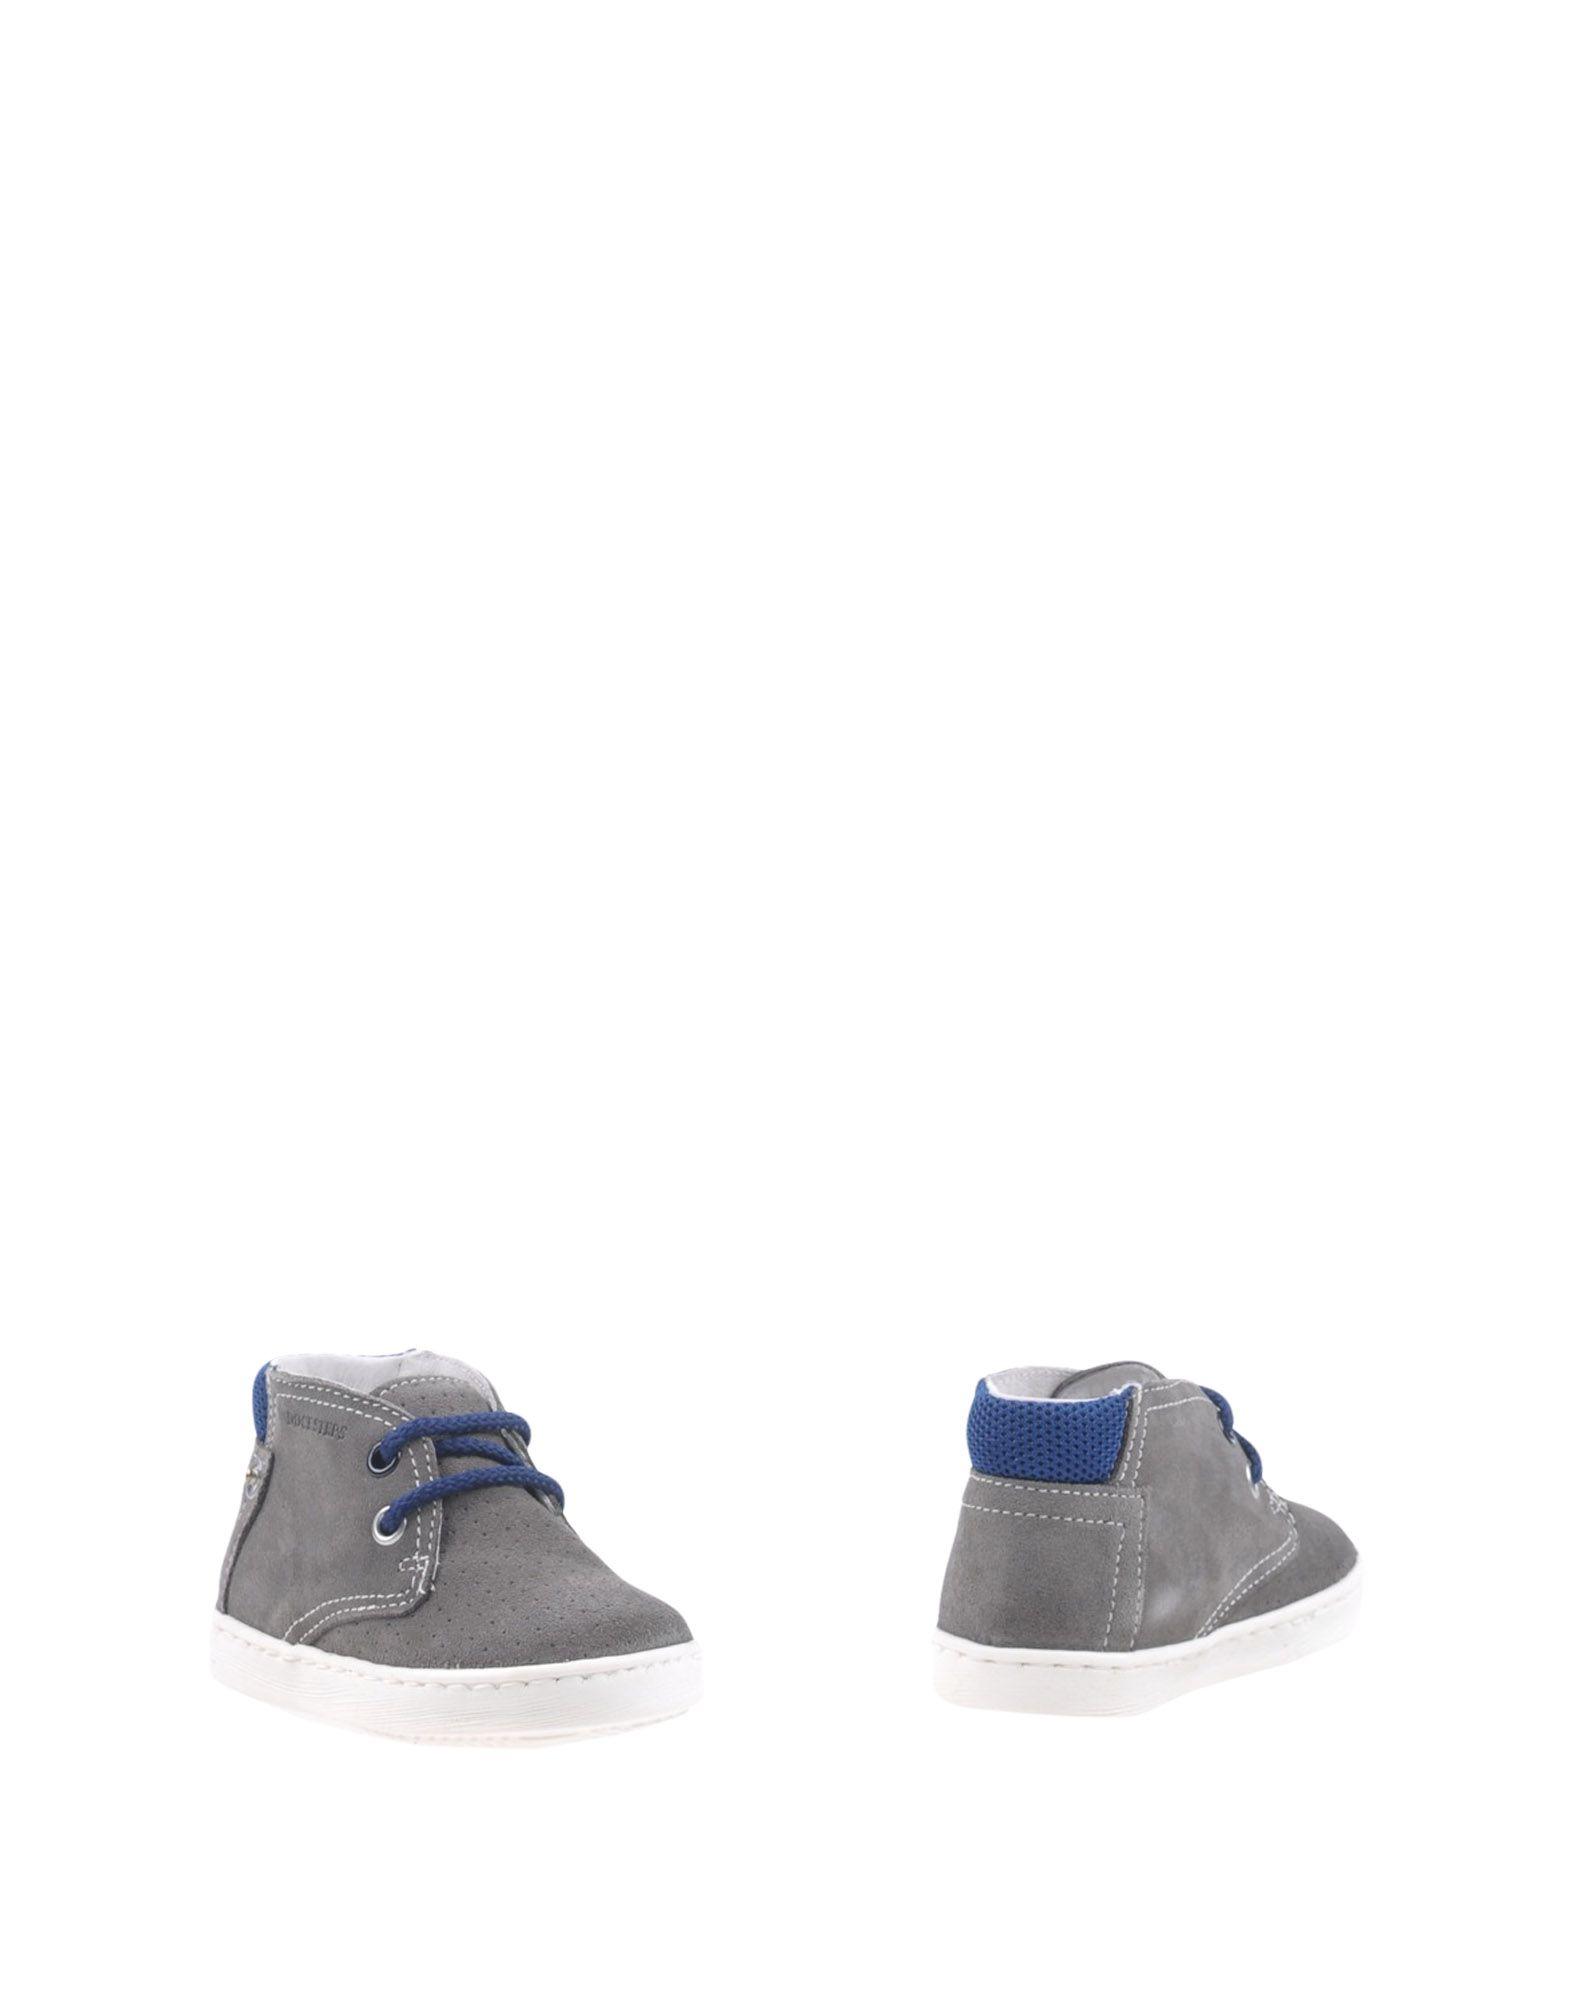 DOCKSTEPS Jungen 0-24 monate Stiefelette Farbe Grau Größe 38